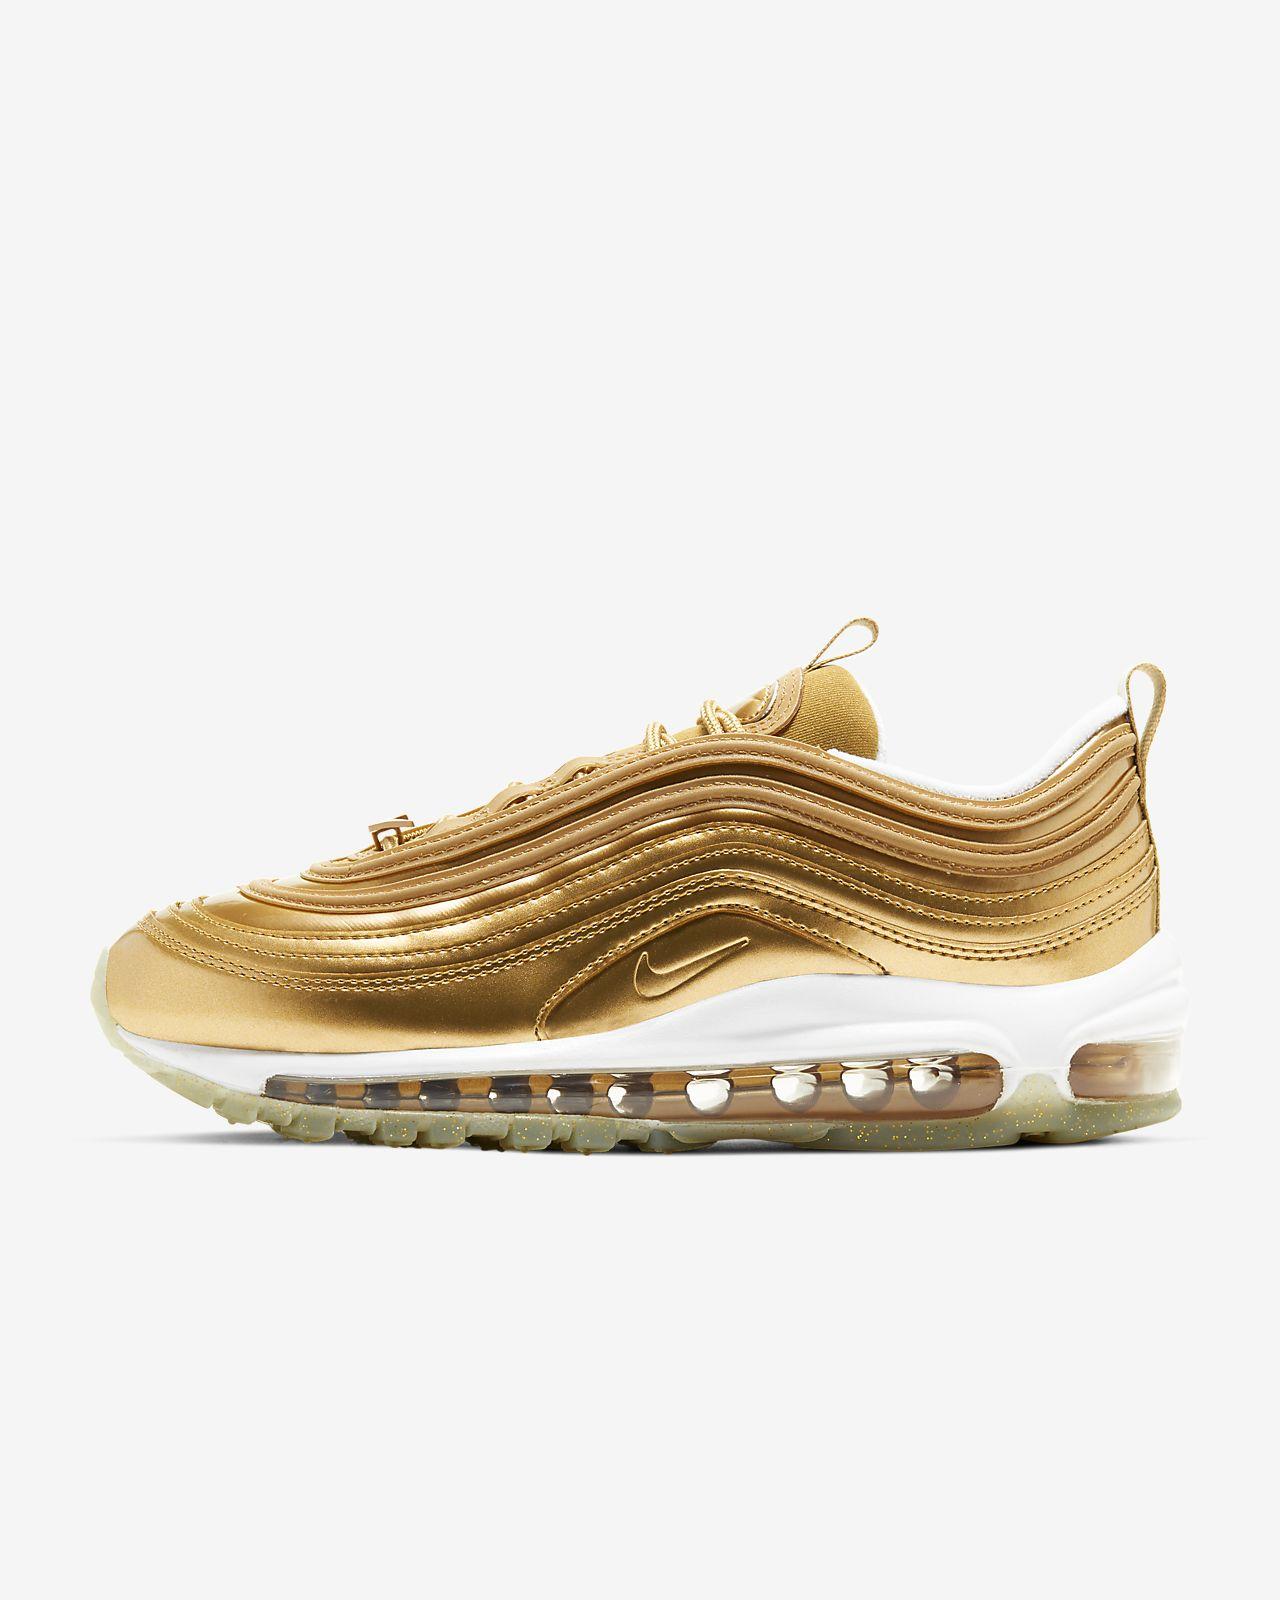 Nike Air Max 97 QS 女子运动鞋